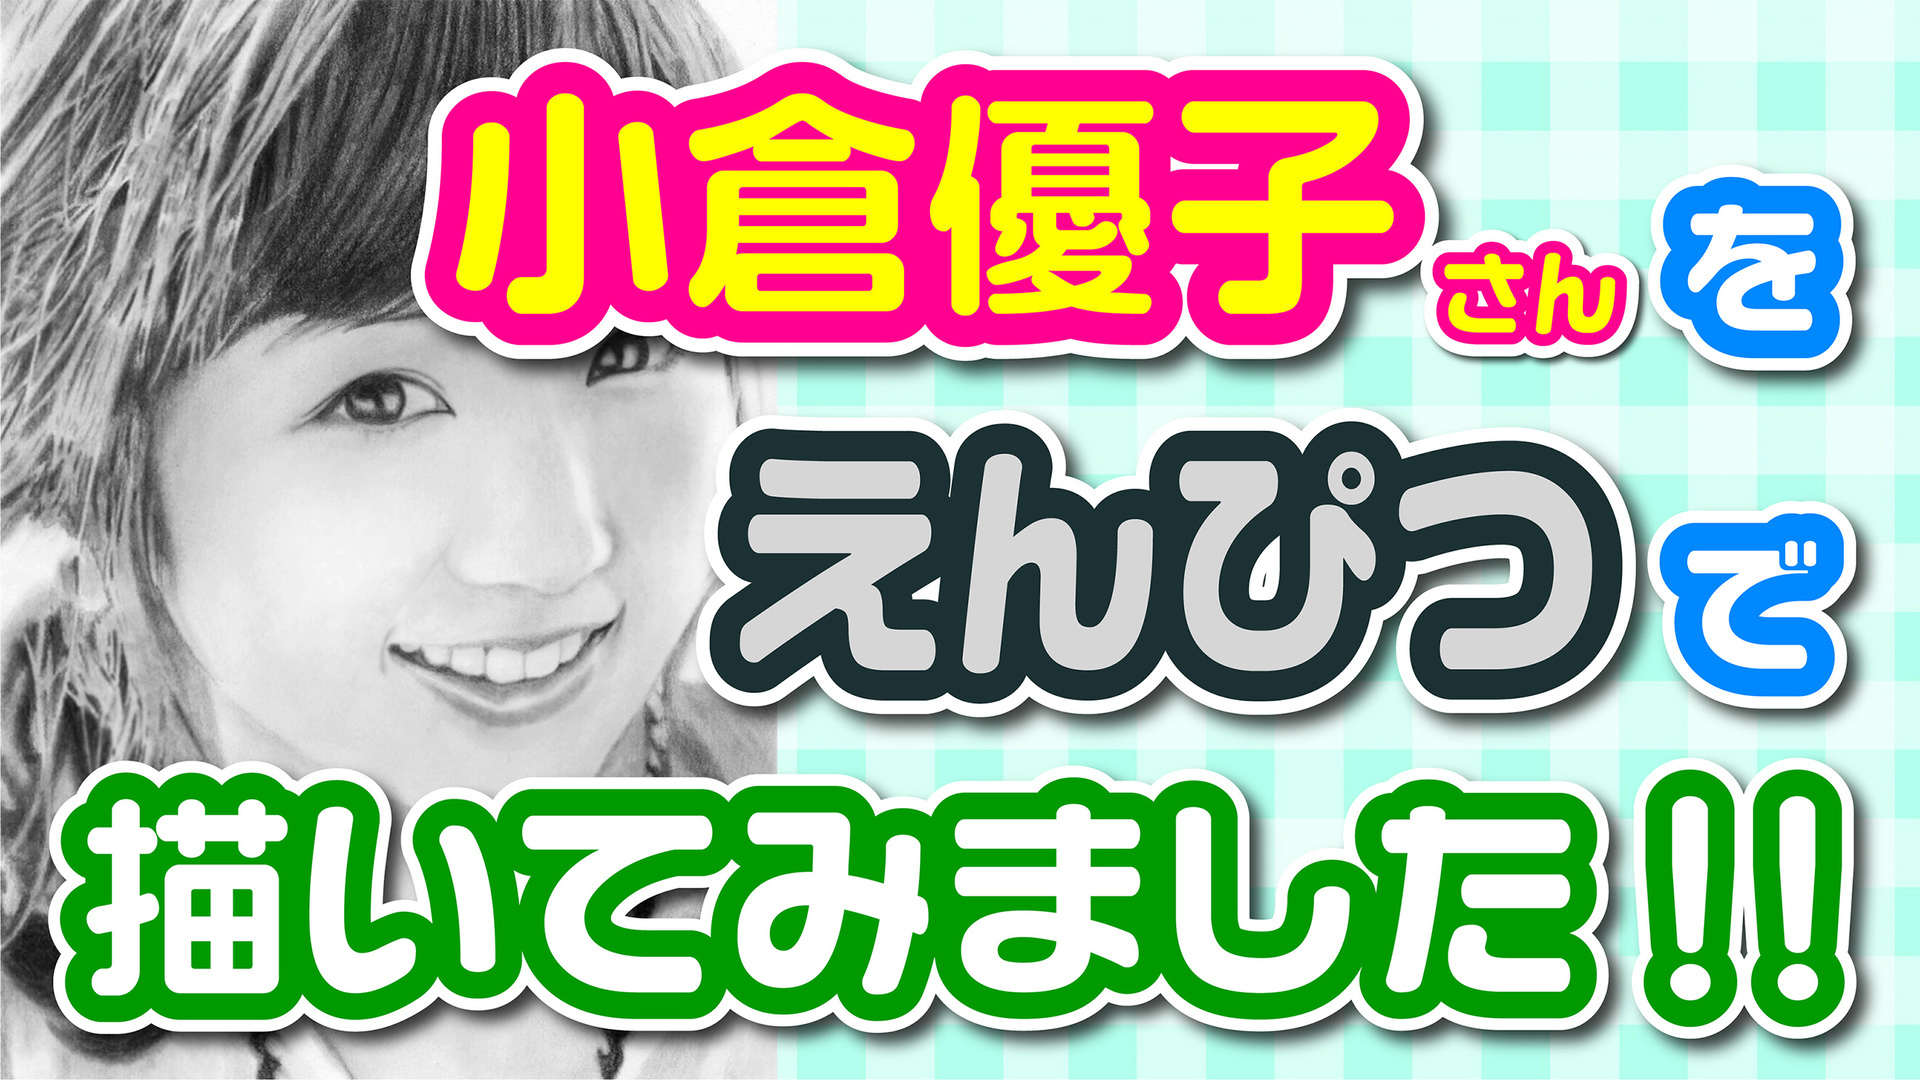 Youtubeサムネイル3.jpg